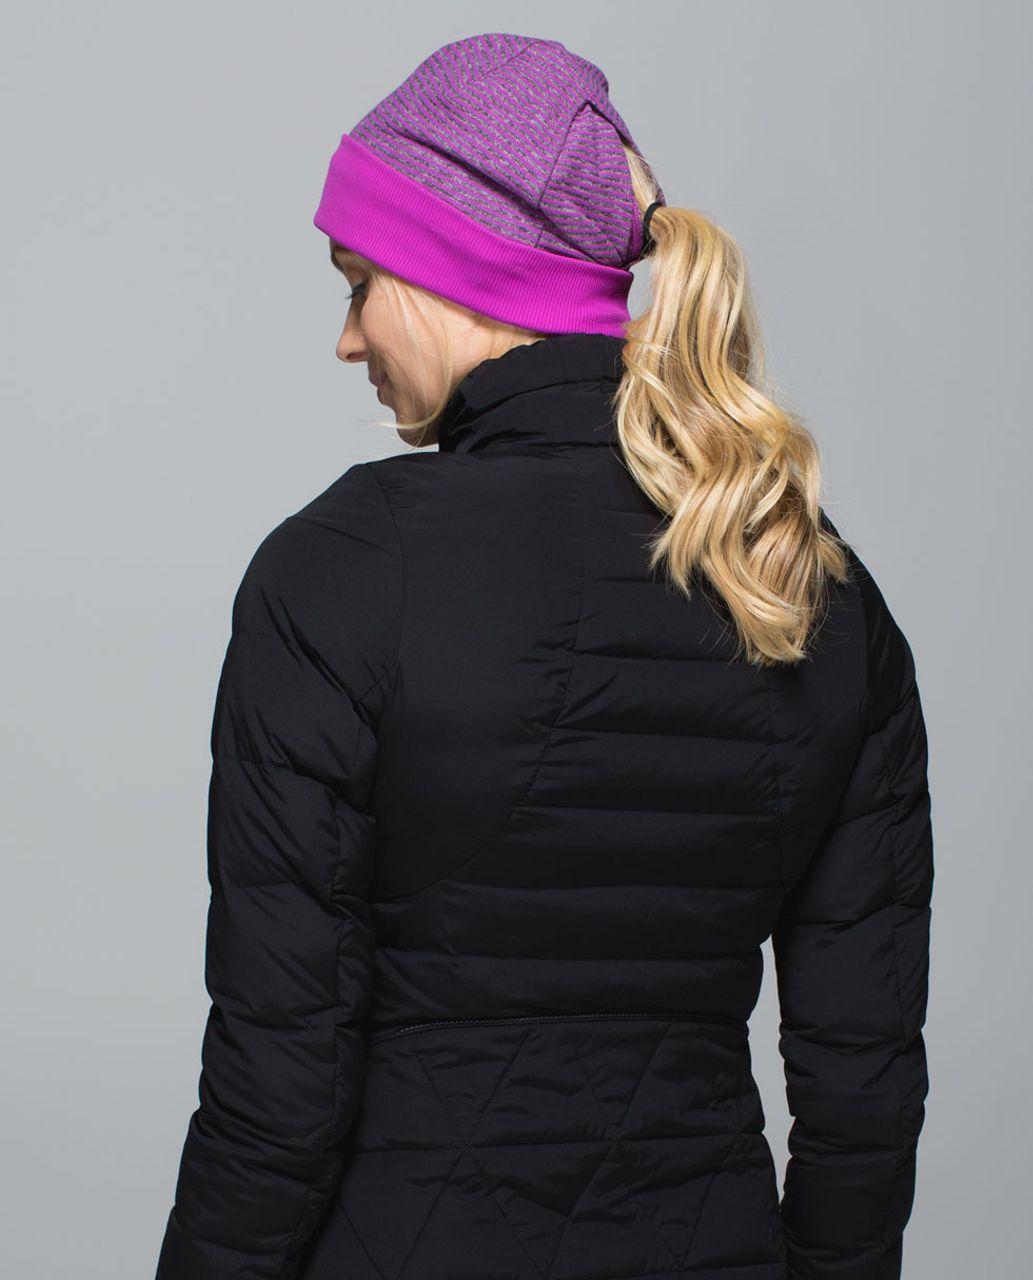 Lululemon Run With Me Toque - Mini Check Pique Ultra Violet Heathered Black / Ultra Violet